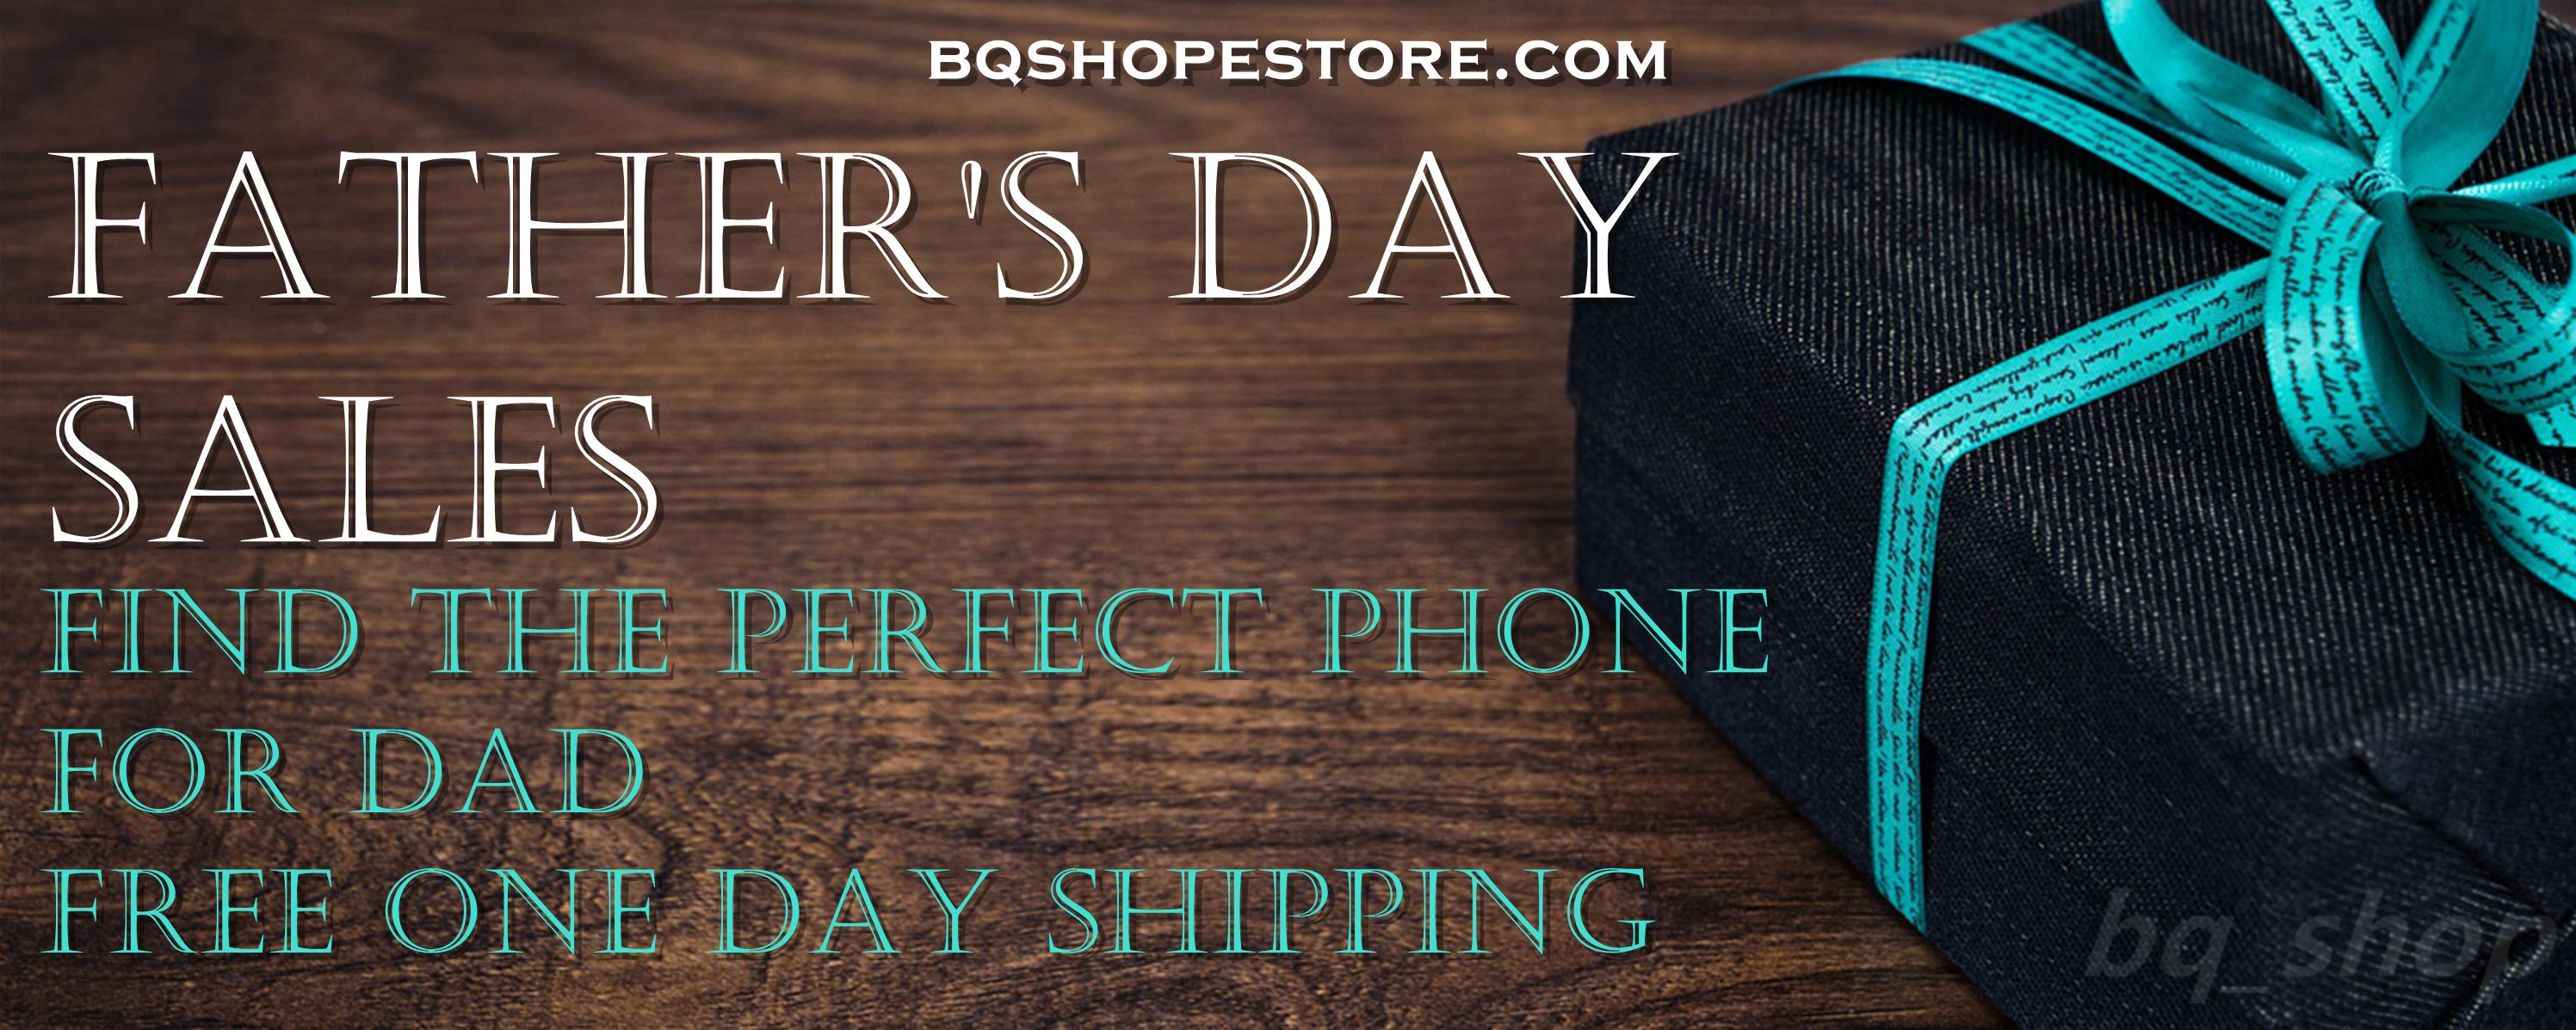 homepagecarousel-fatherday-sales-bqshopestore.com.png